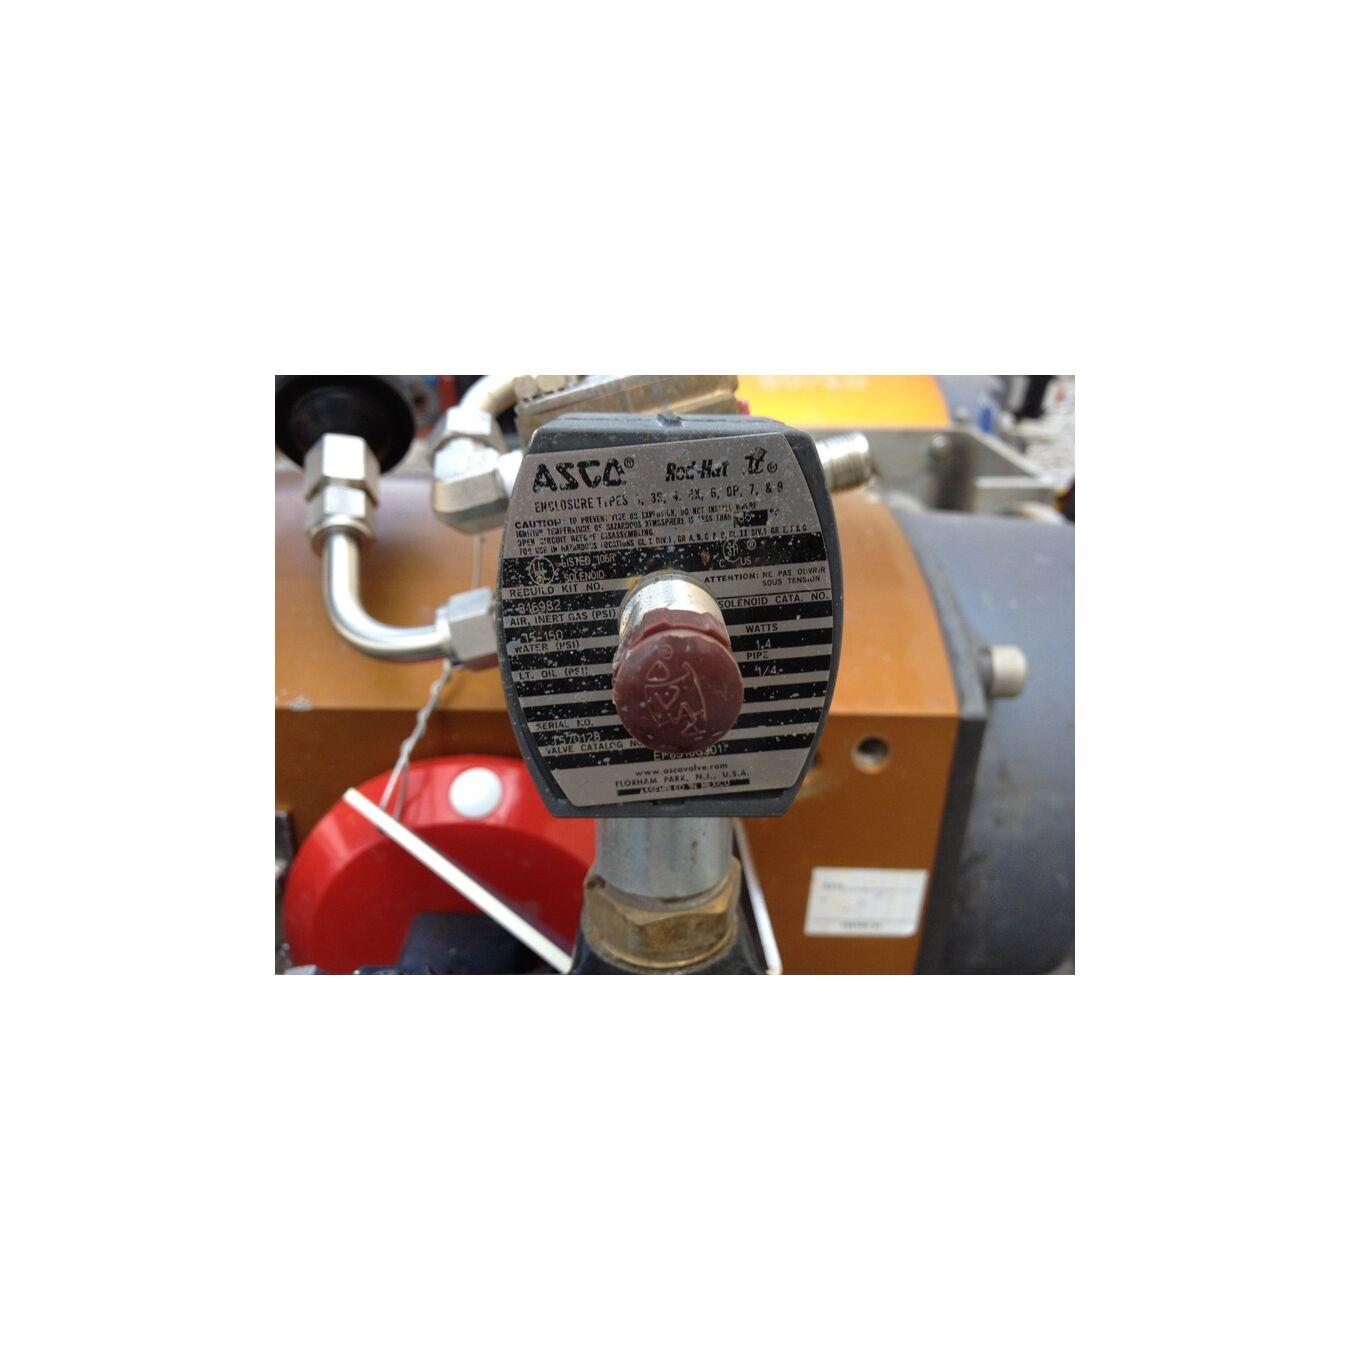 2 Quot Durco Sleeveline Plug Valve Tsg4 Severe Service For